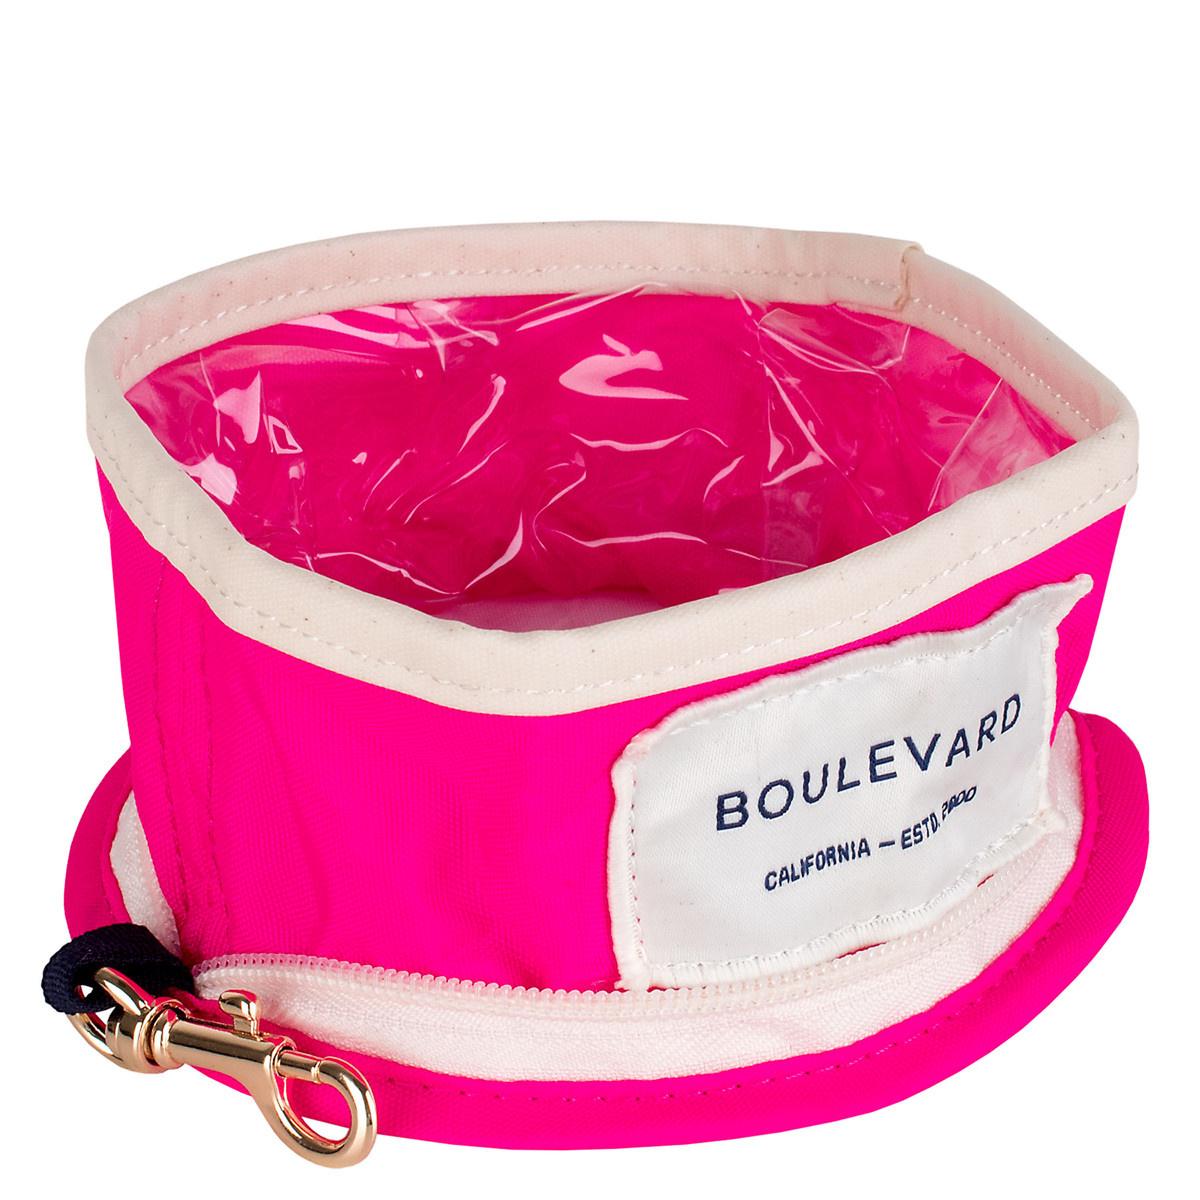 Boulevard Travel Dog Bowl